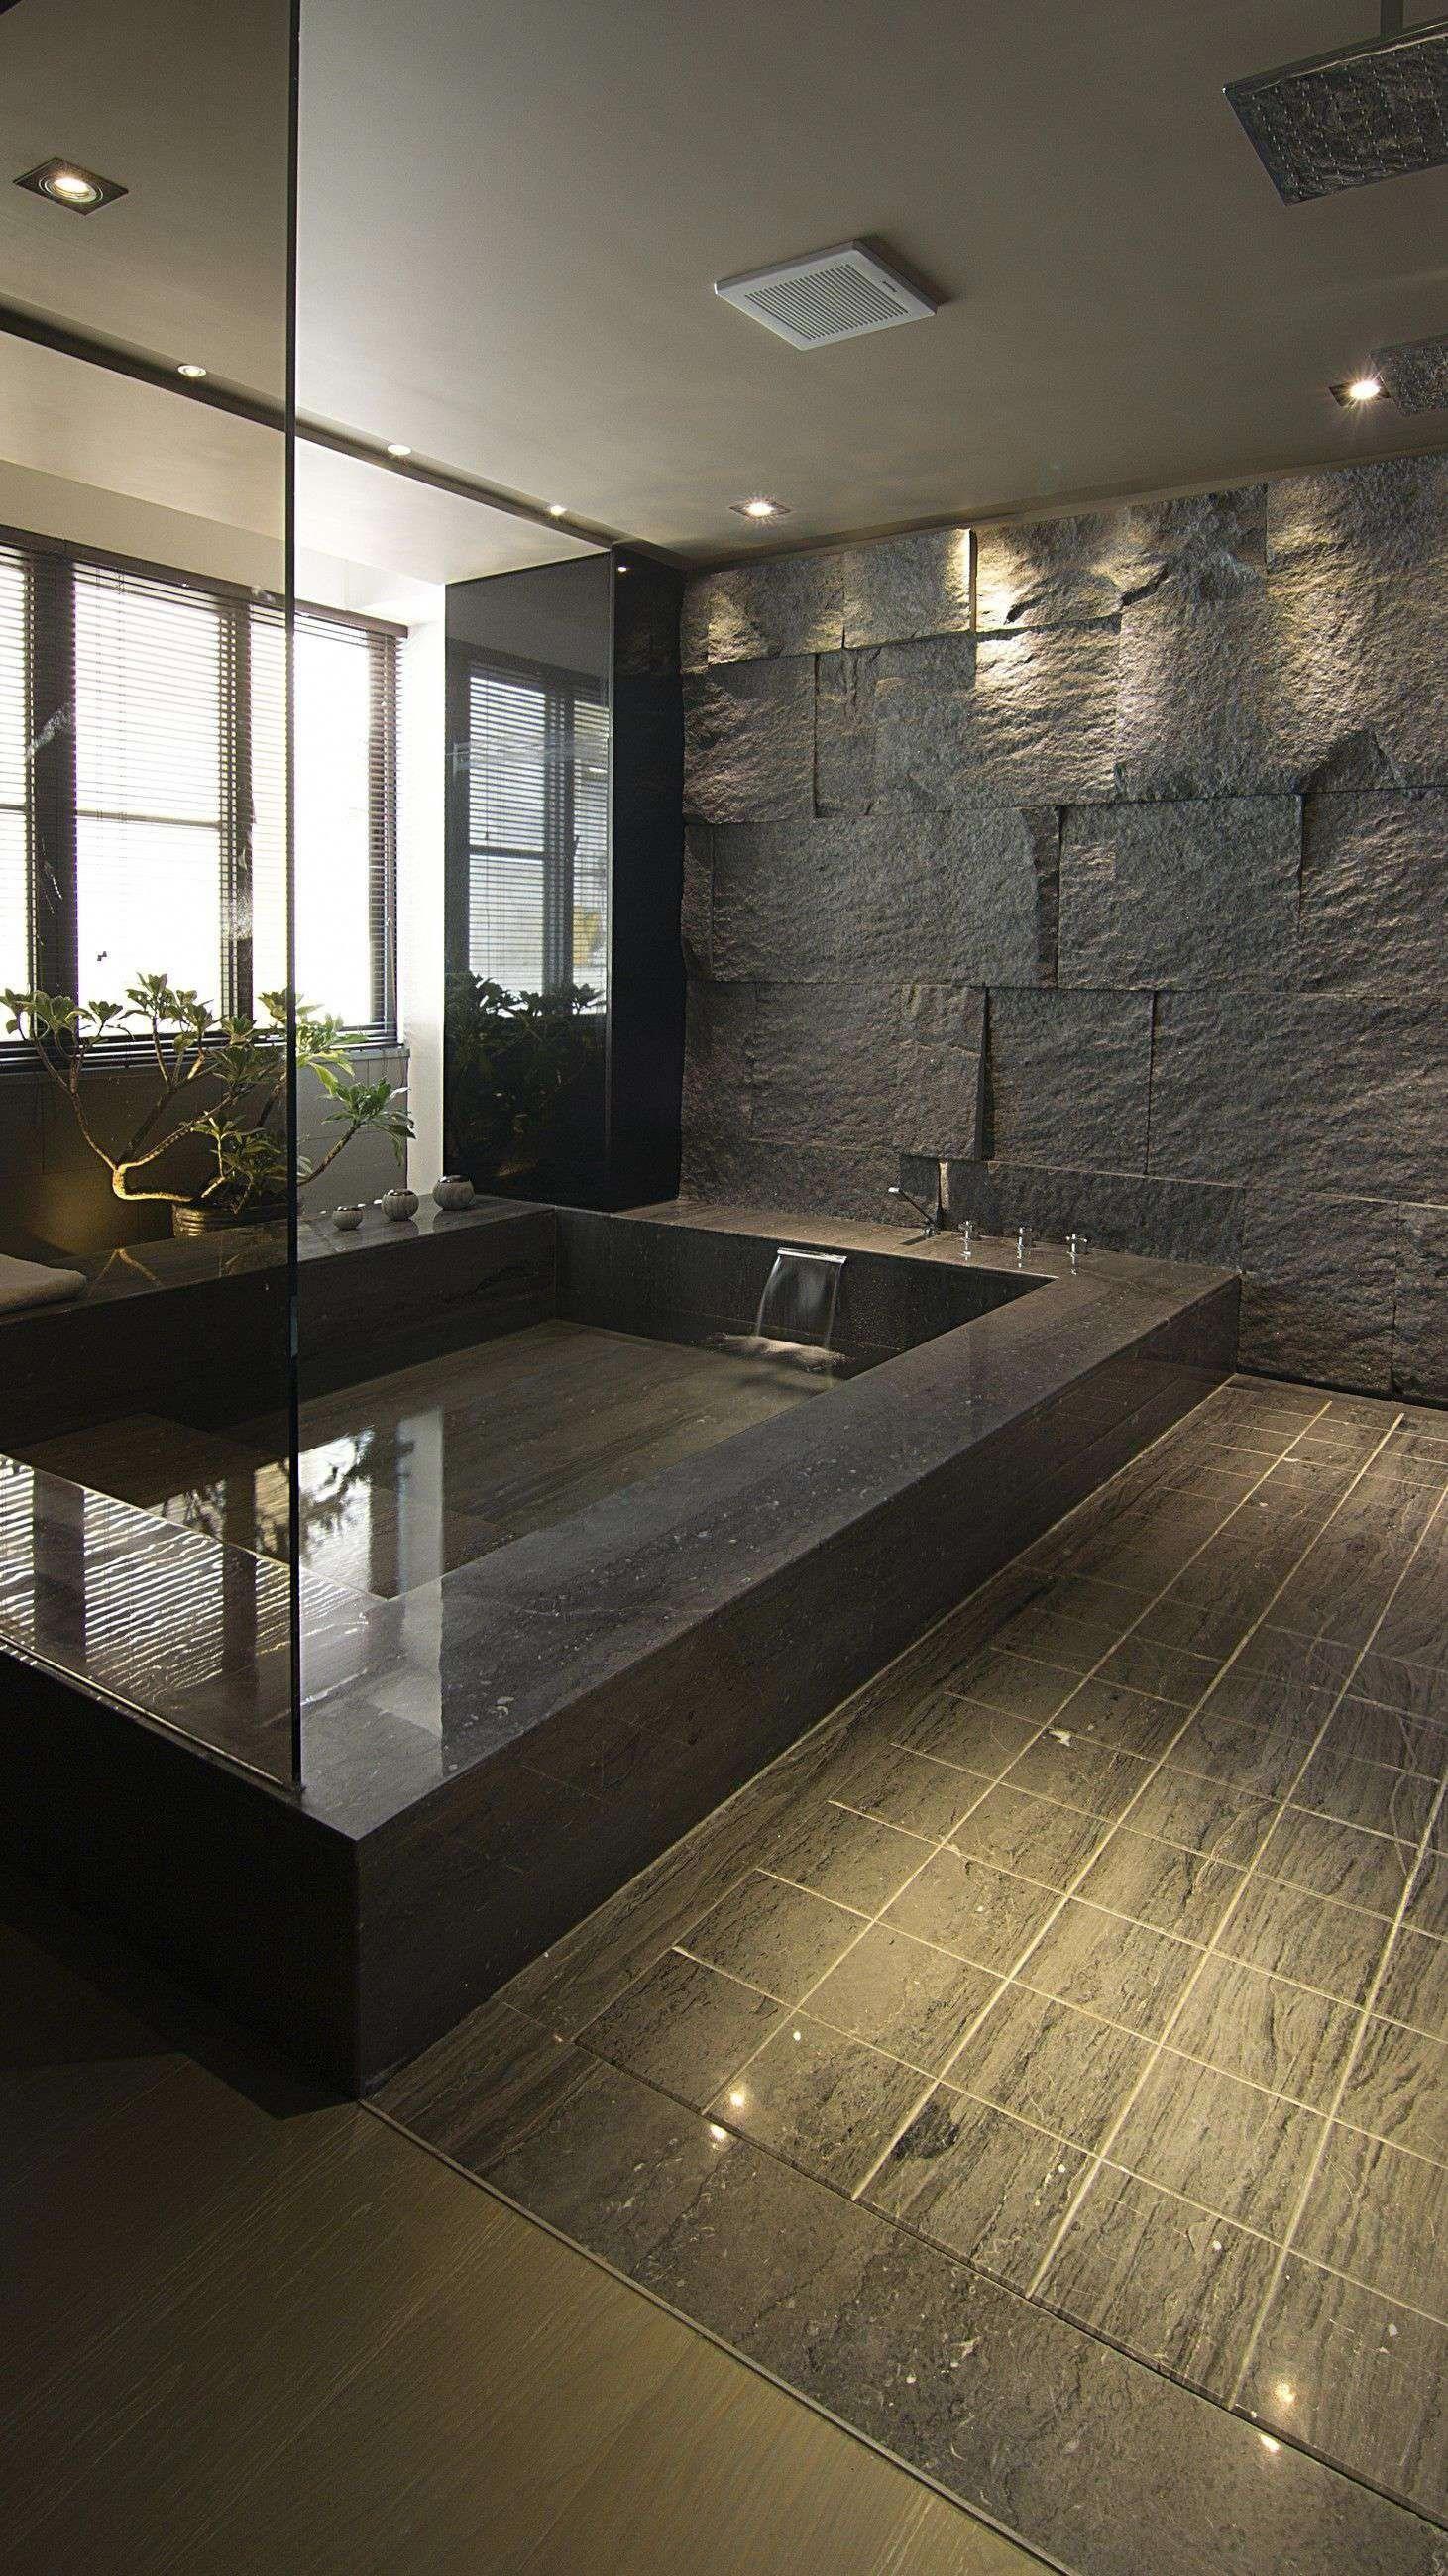 Modern Luxury Bedroom Interior Design Moderninteriordesign Bathroom Design Luxury Bathroom Interior Design Dream Bathrooms